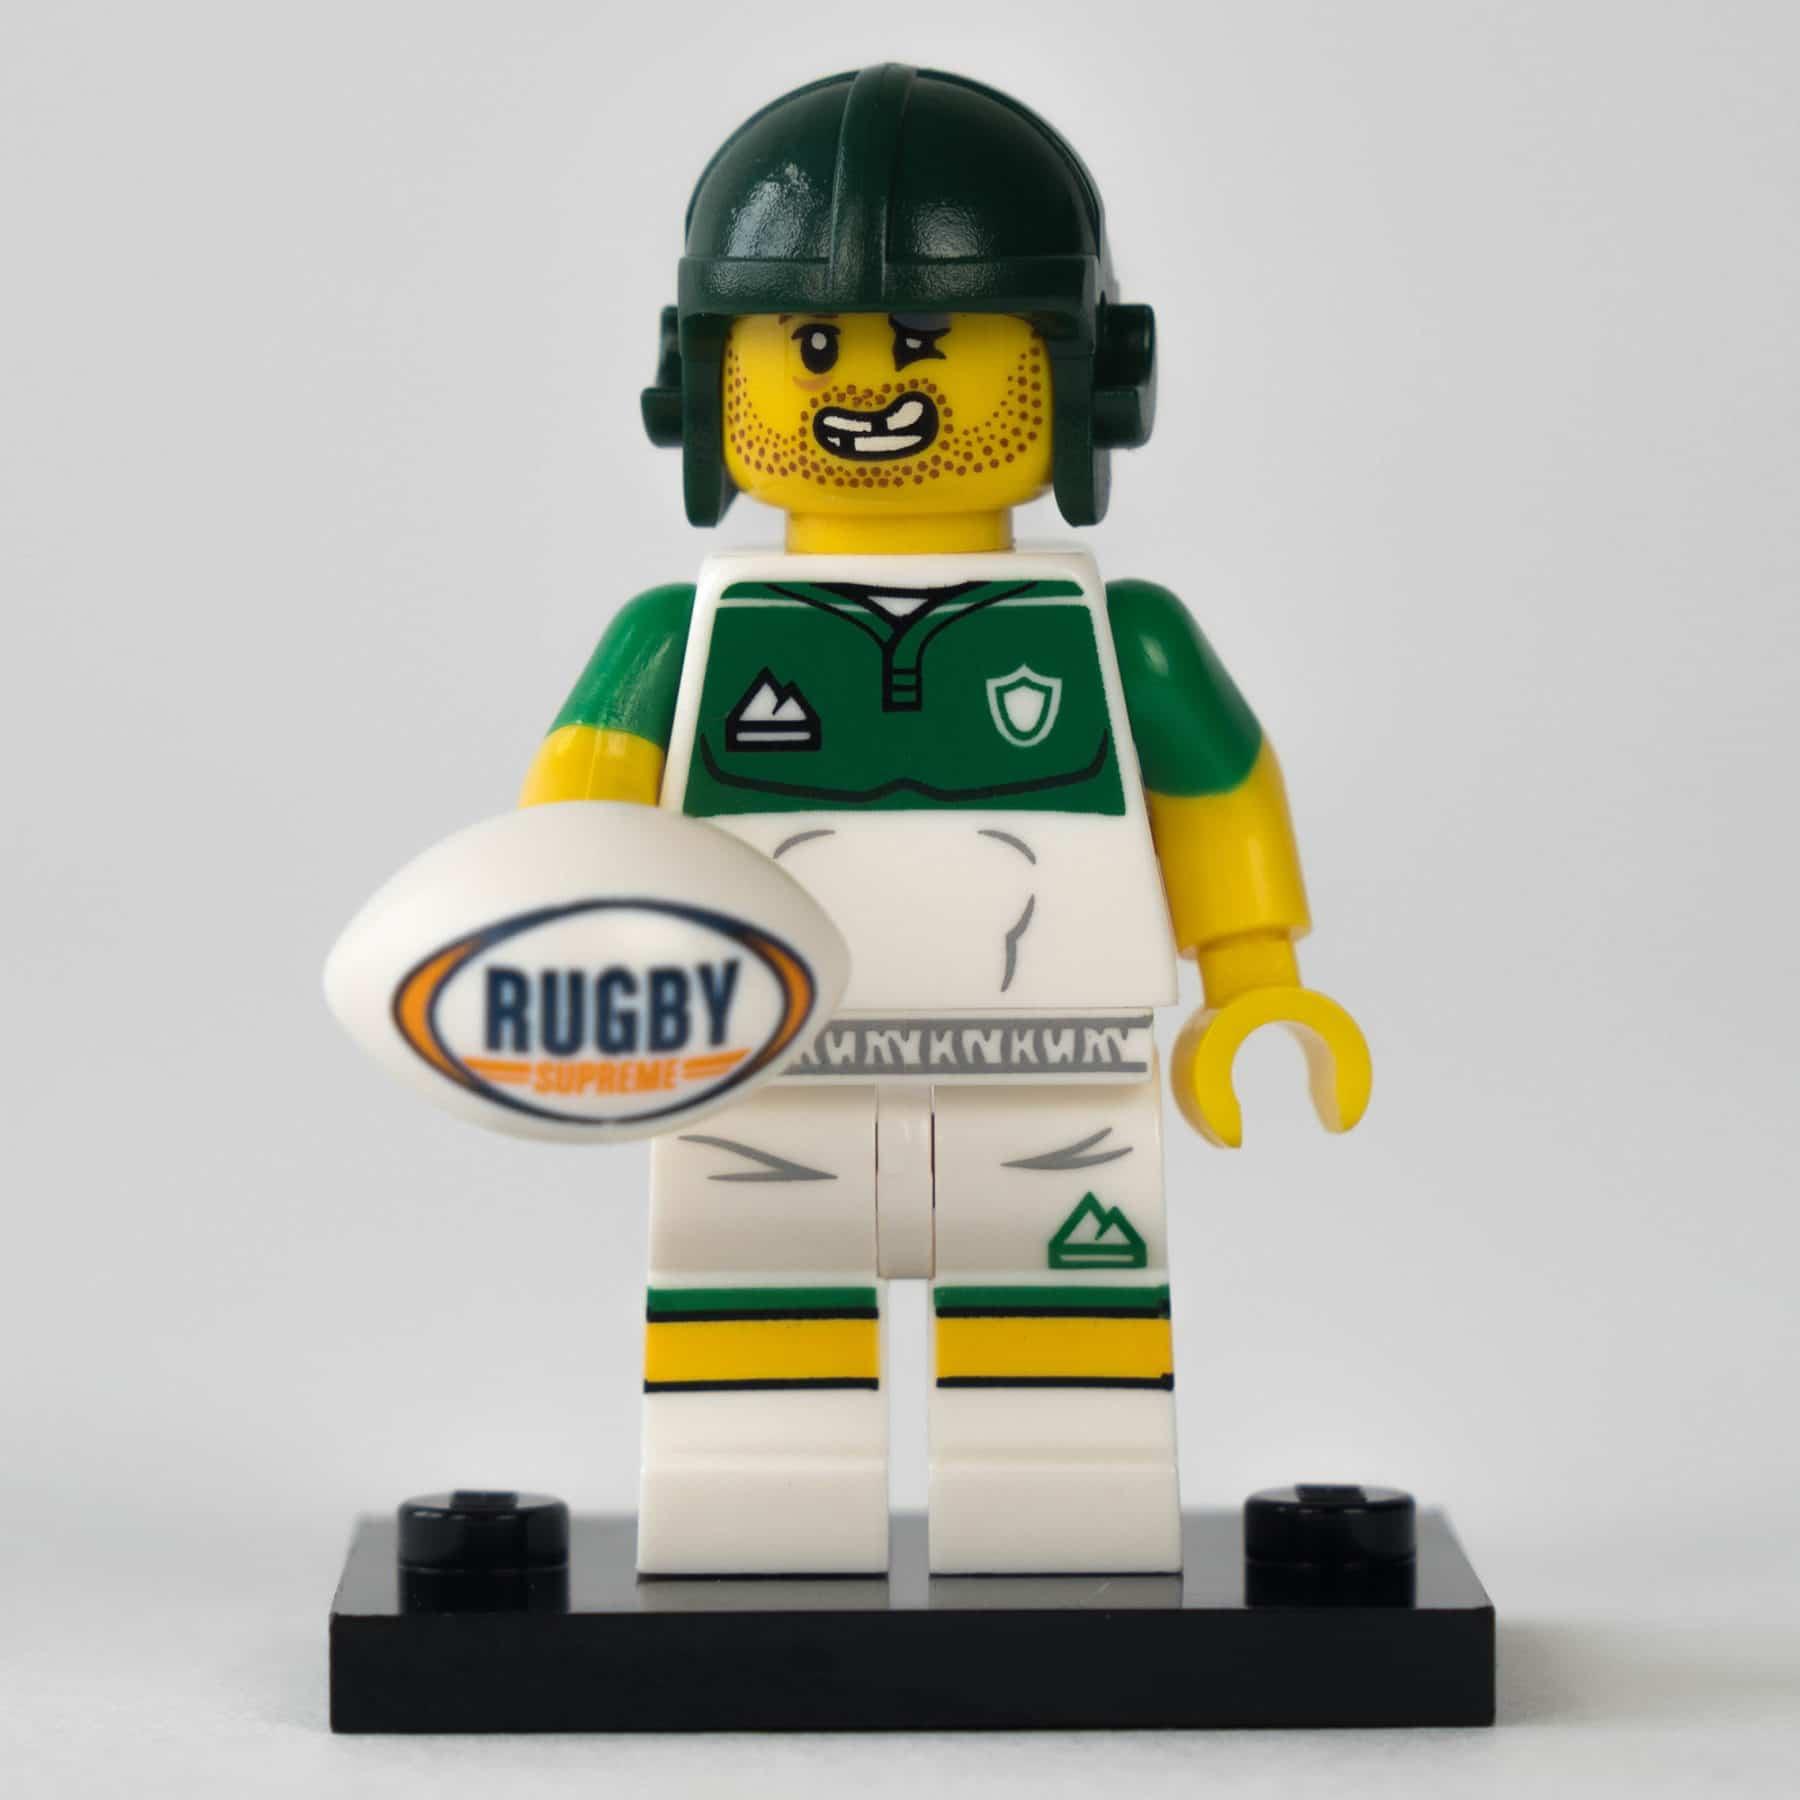 LEGO 71025 Minifigur: Rugby-Spieler